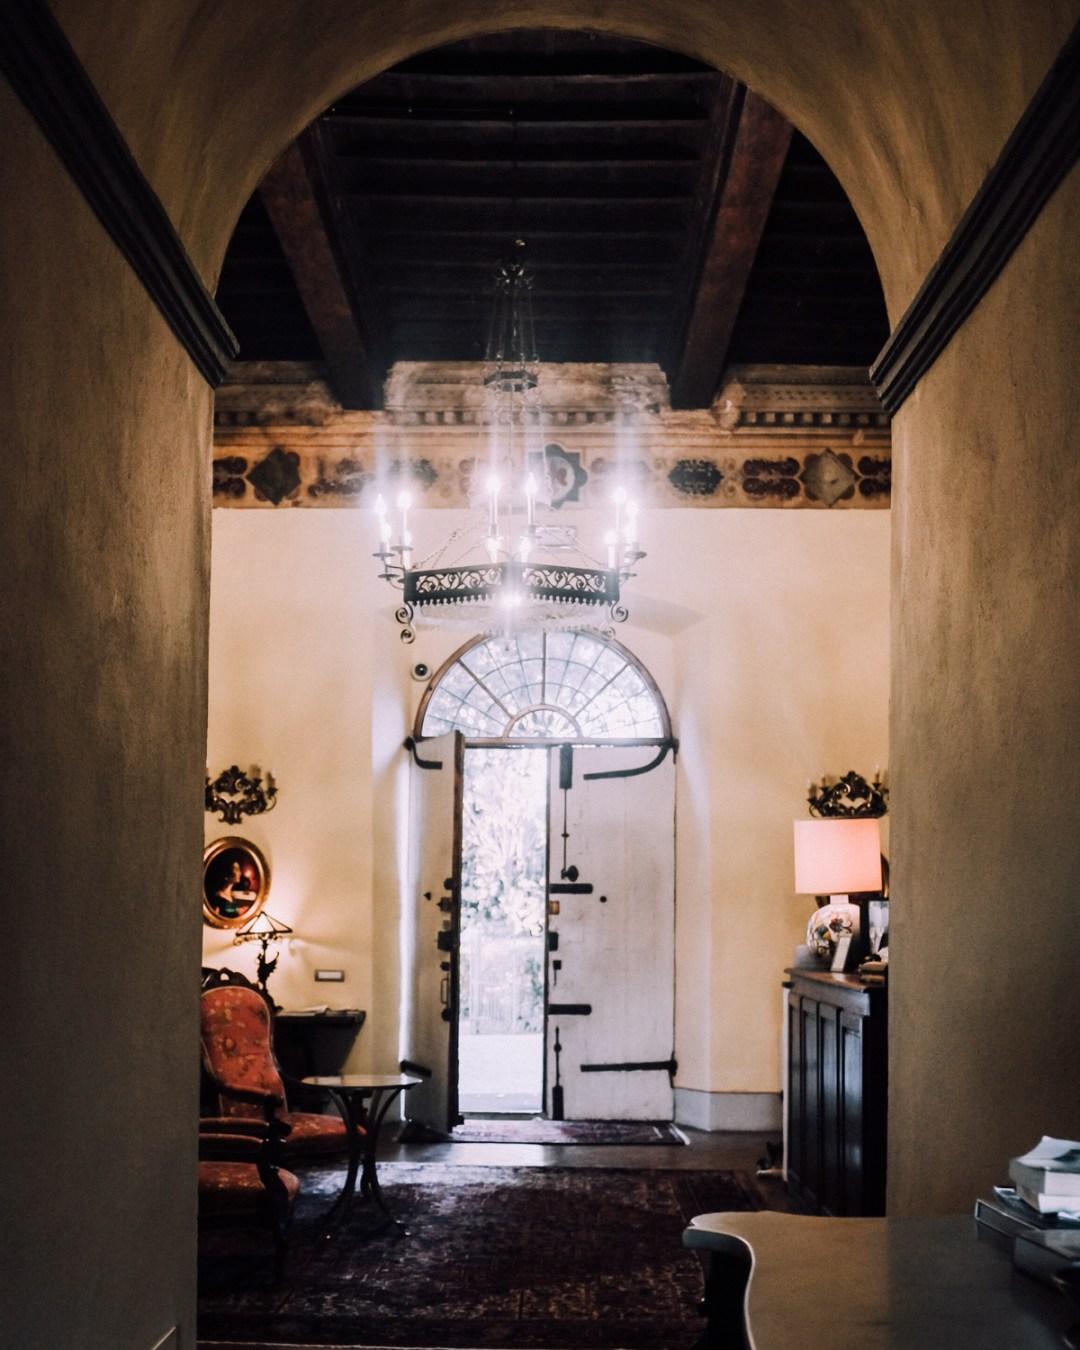 inastil, Ü50Blogger, Reiseblogger, Toskana, Villa, Florenz, Siena, Certaldo, Lifestyle, Italienreise, Italienliebe, Cabriotour-5